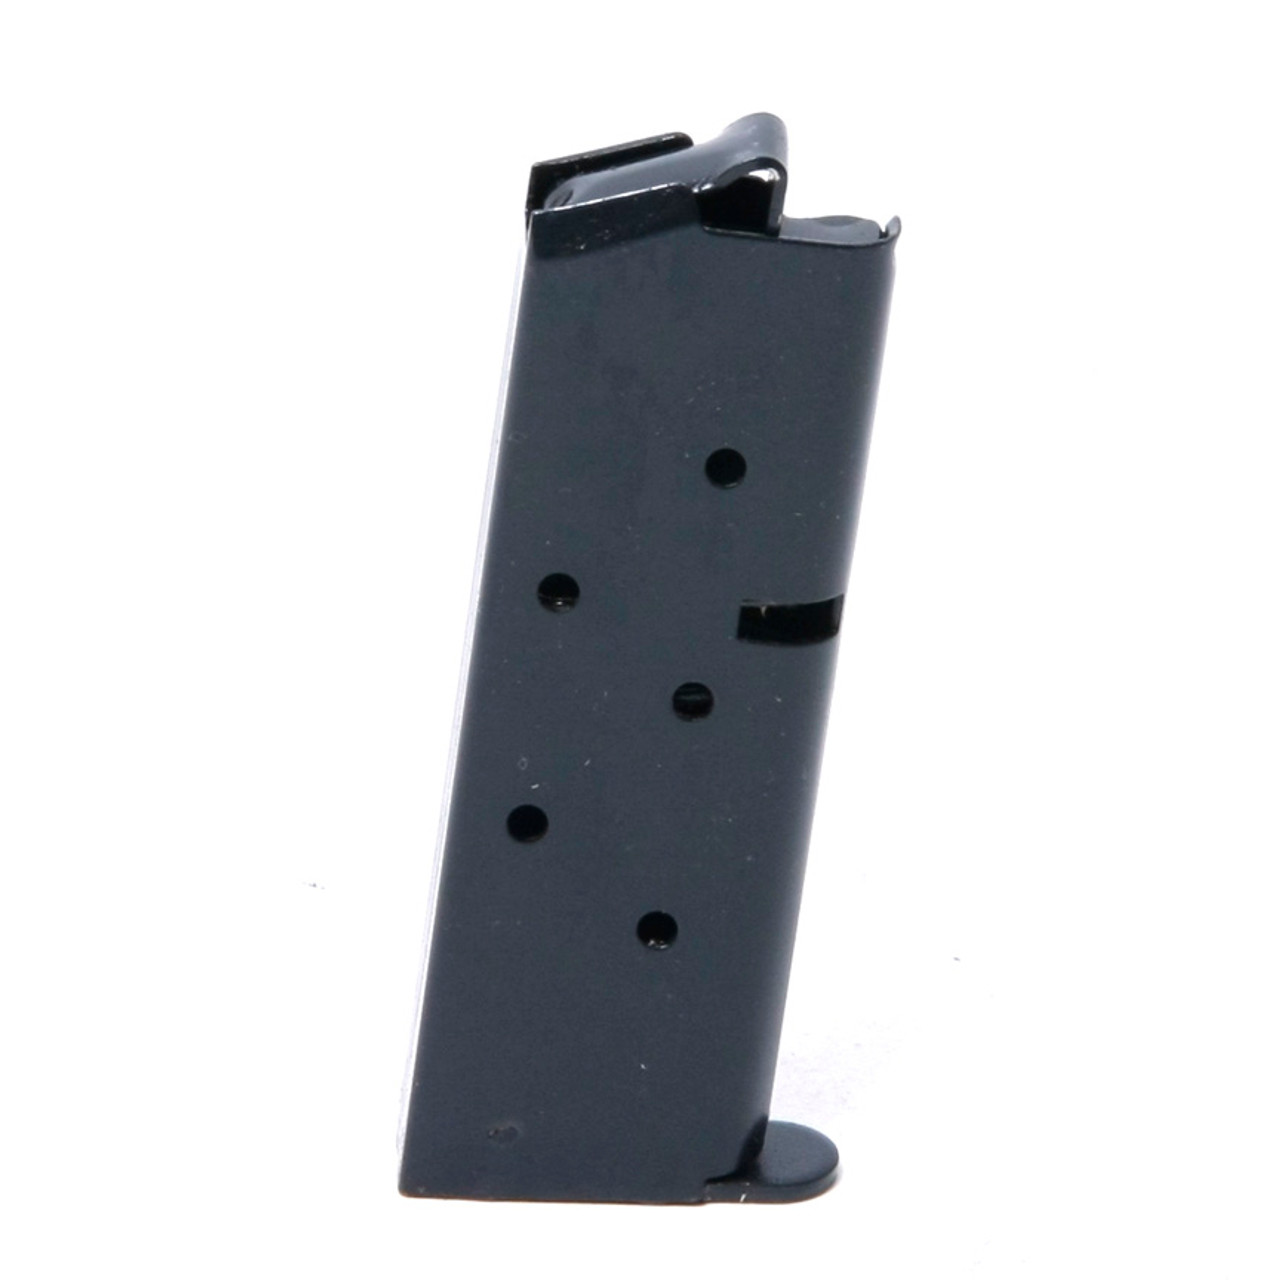 Colt® Mustang® & Pocketlite .380 ACP (6) Rd - Blue Steel